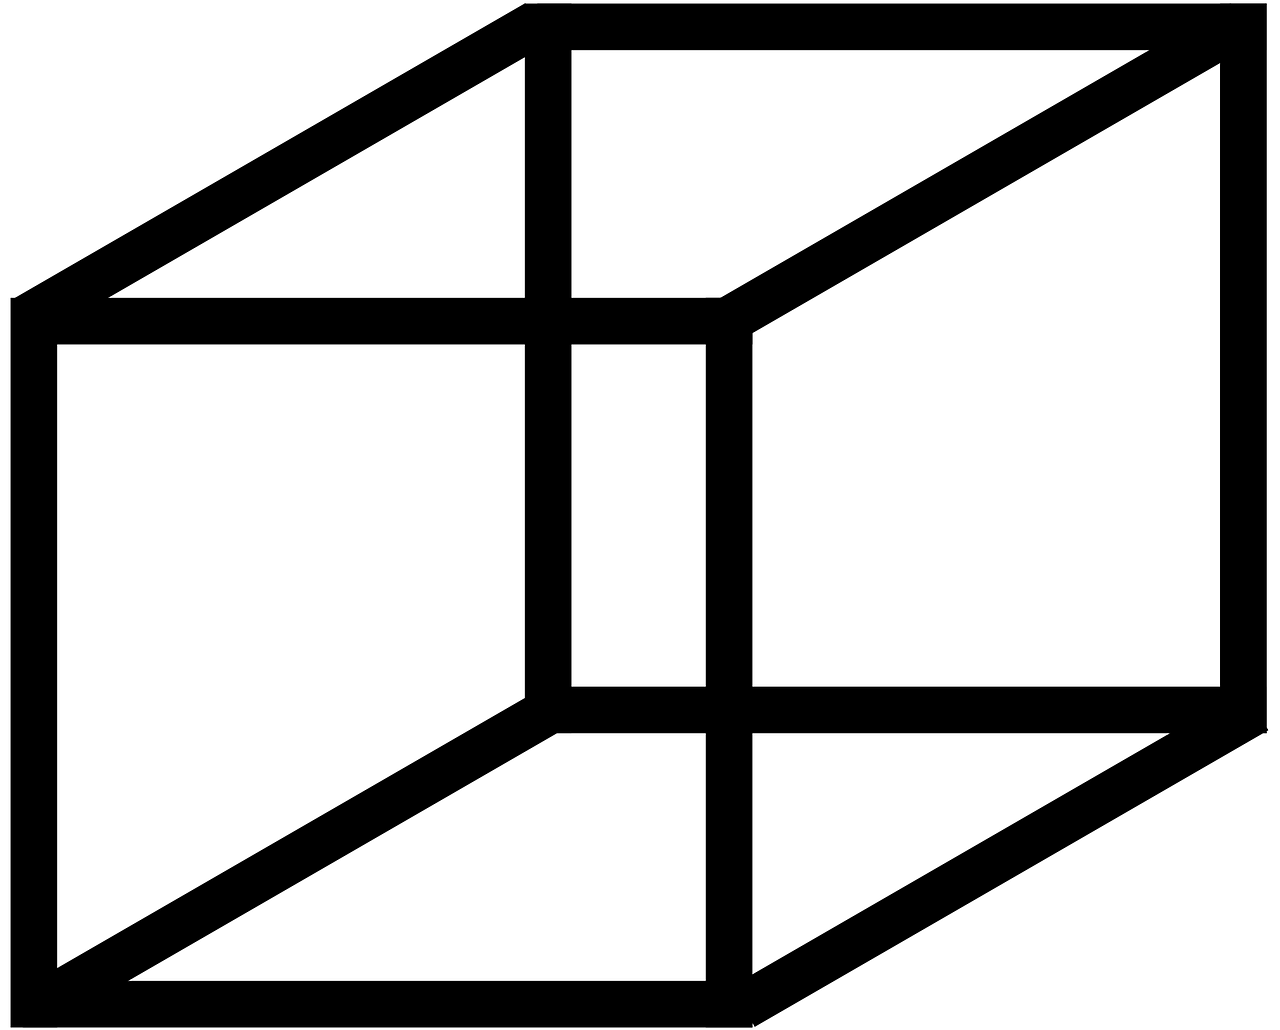 Rechteck